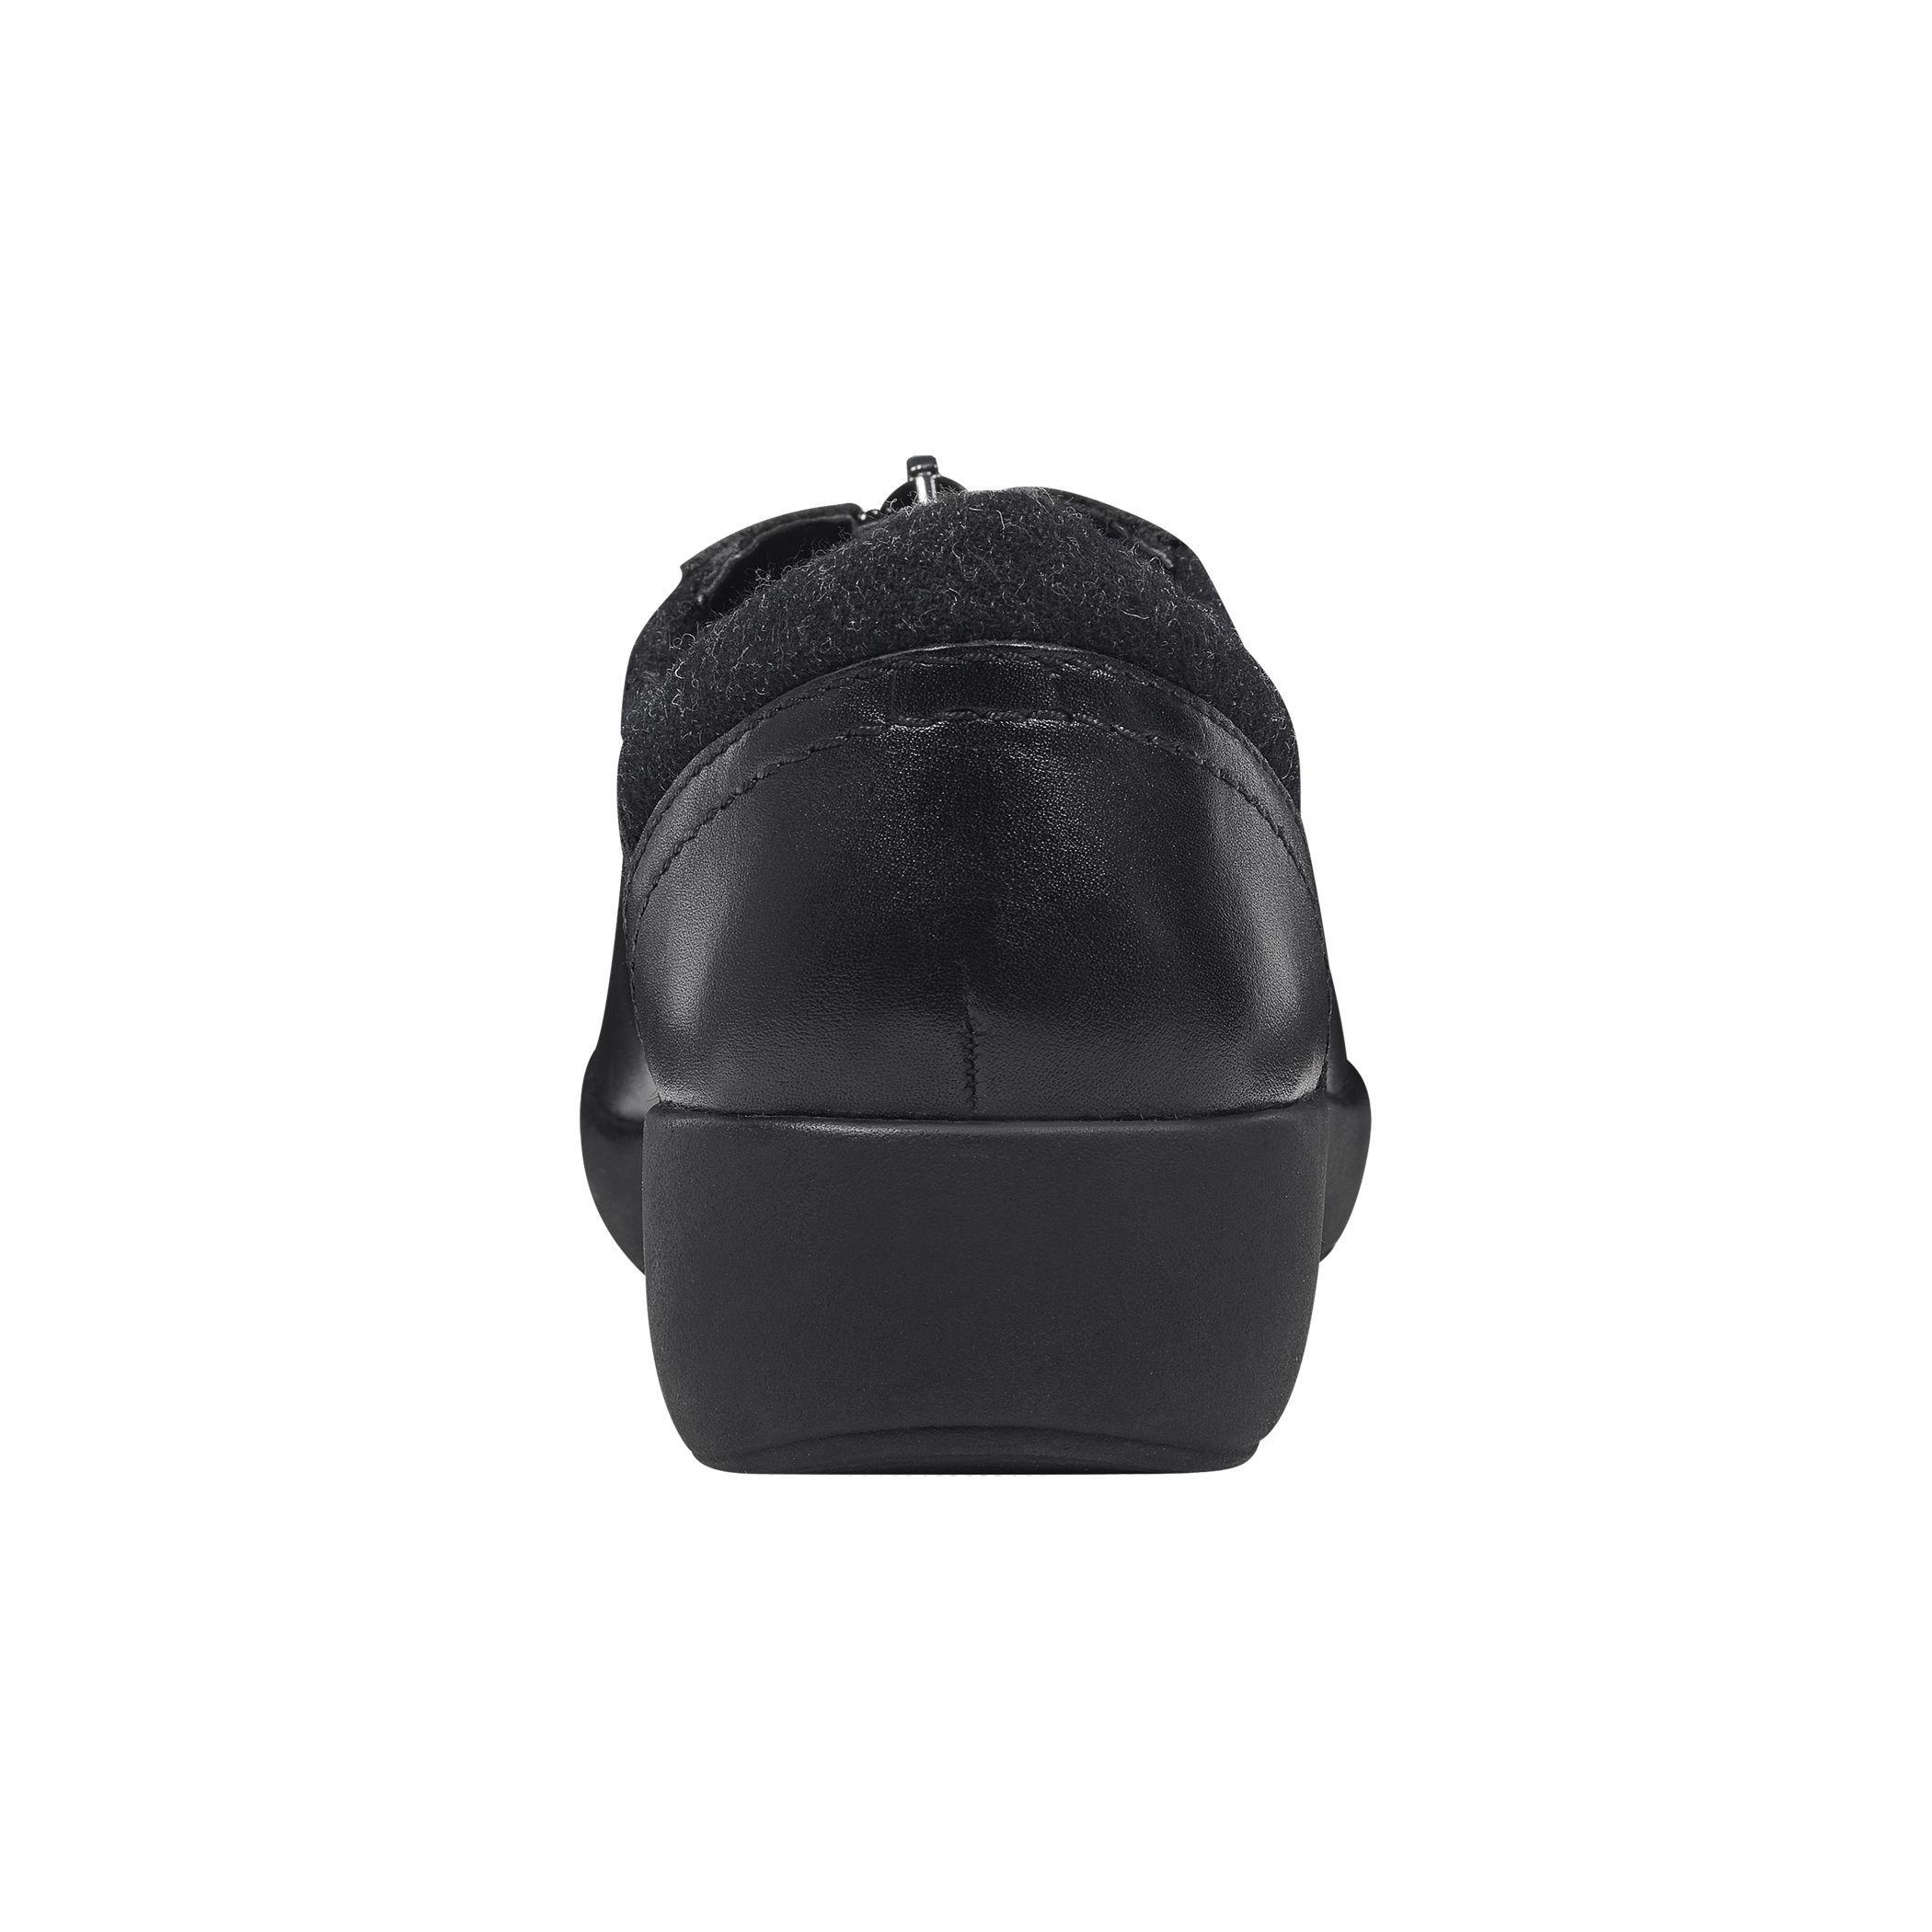 Lyst Easy Spirit Kelerie Leather Casual Flats In Black Zipora Jeans Gallery